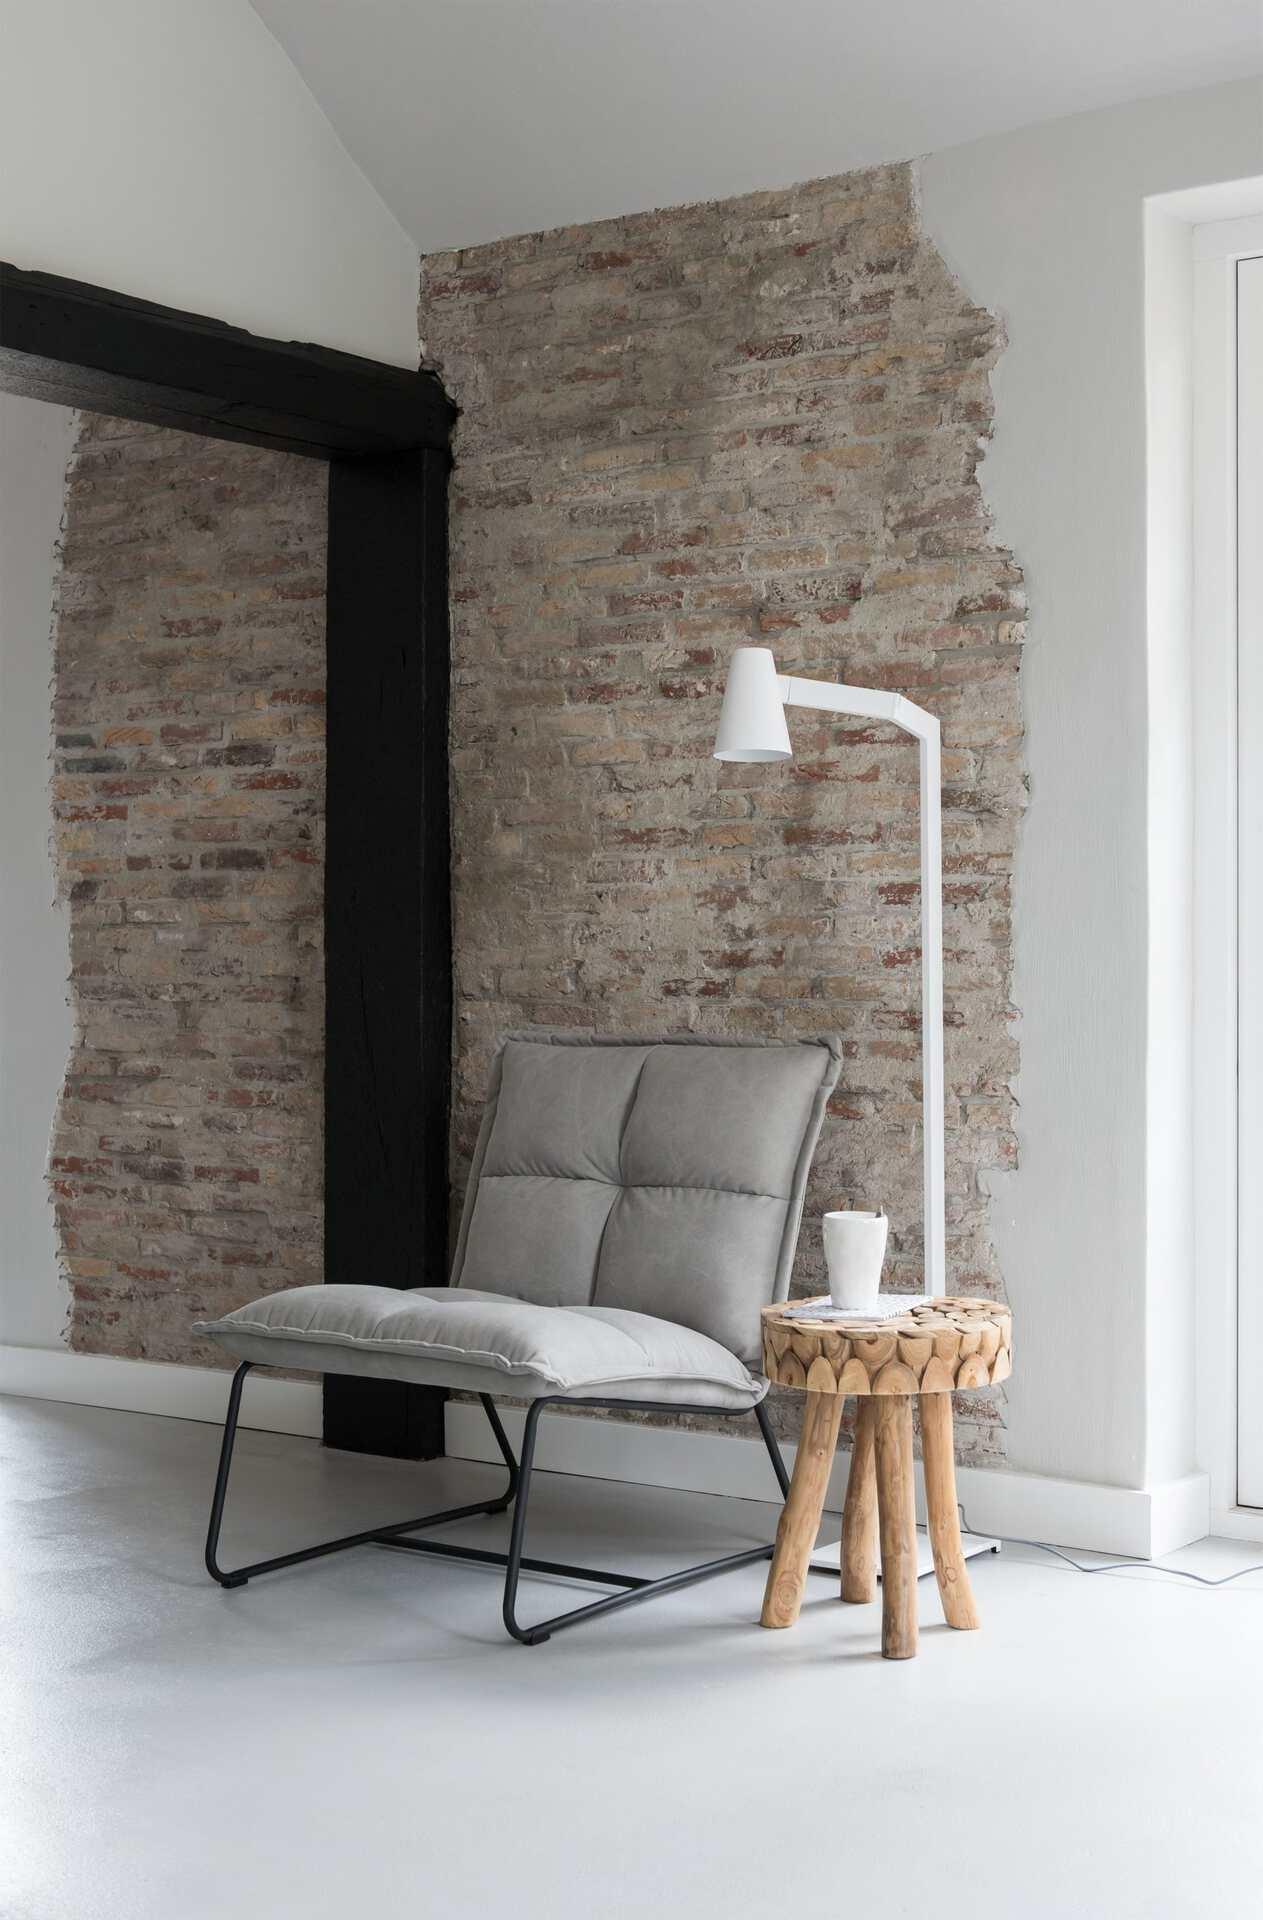 Snugg Must Living Cloud XL Lounge chair__harmaa nojatuoli